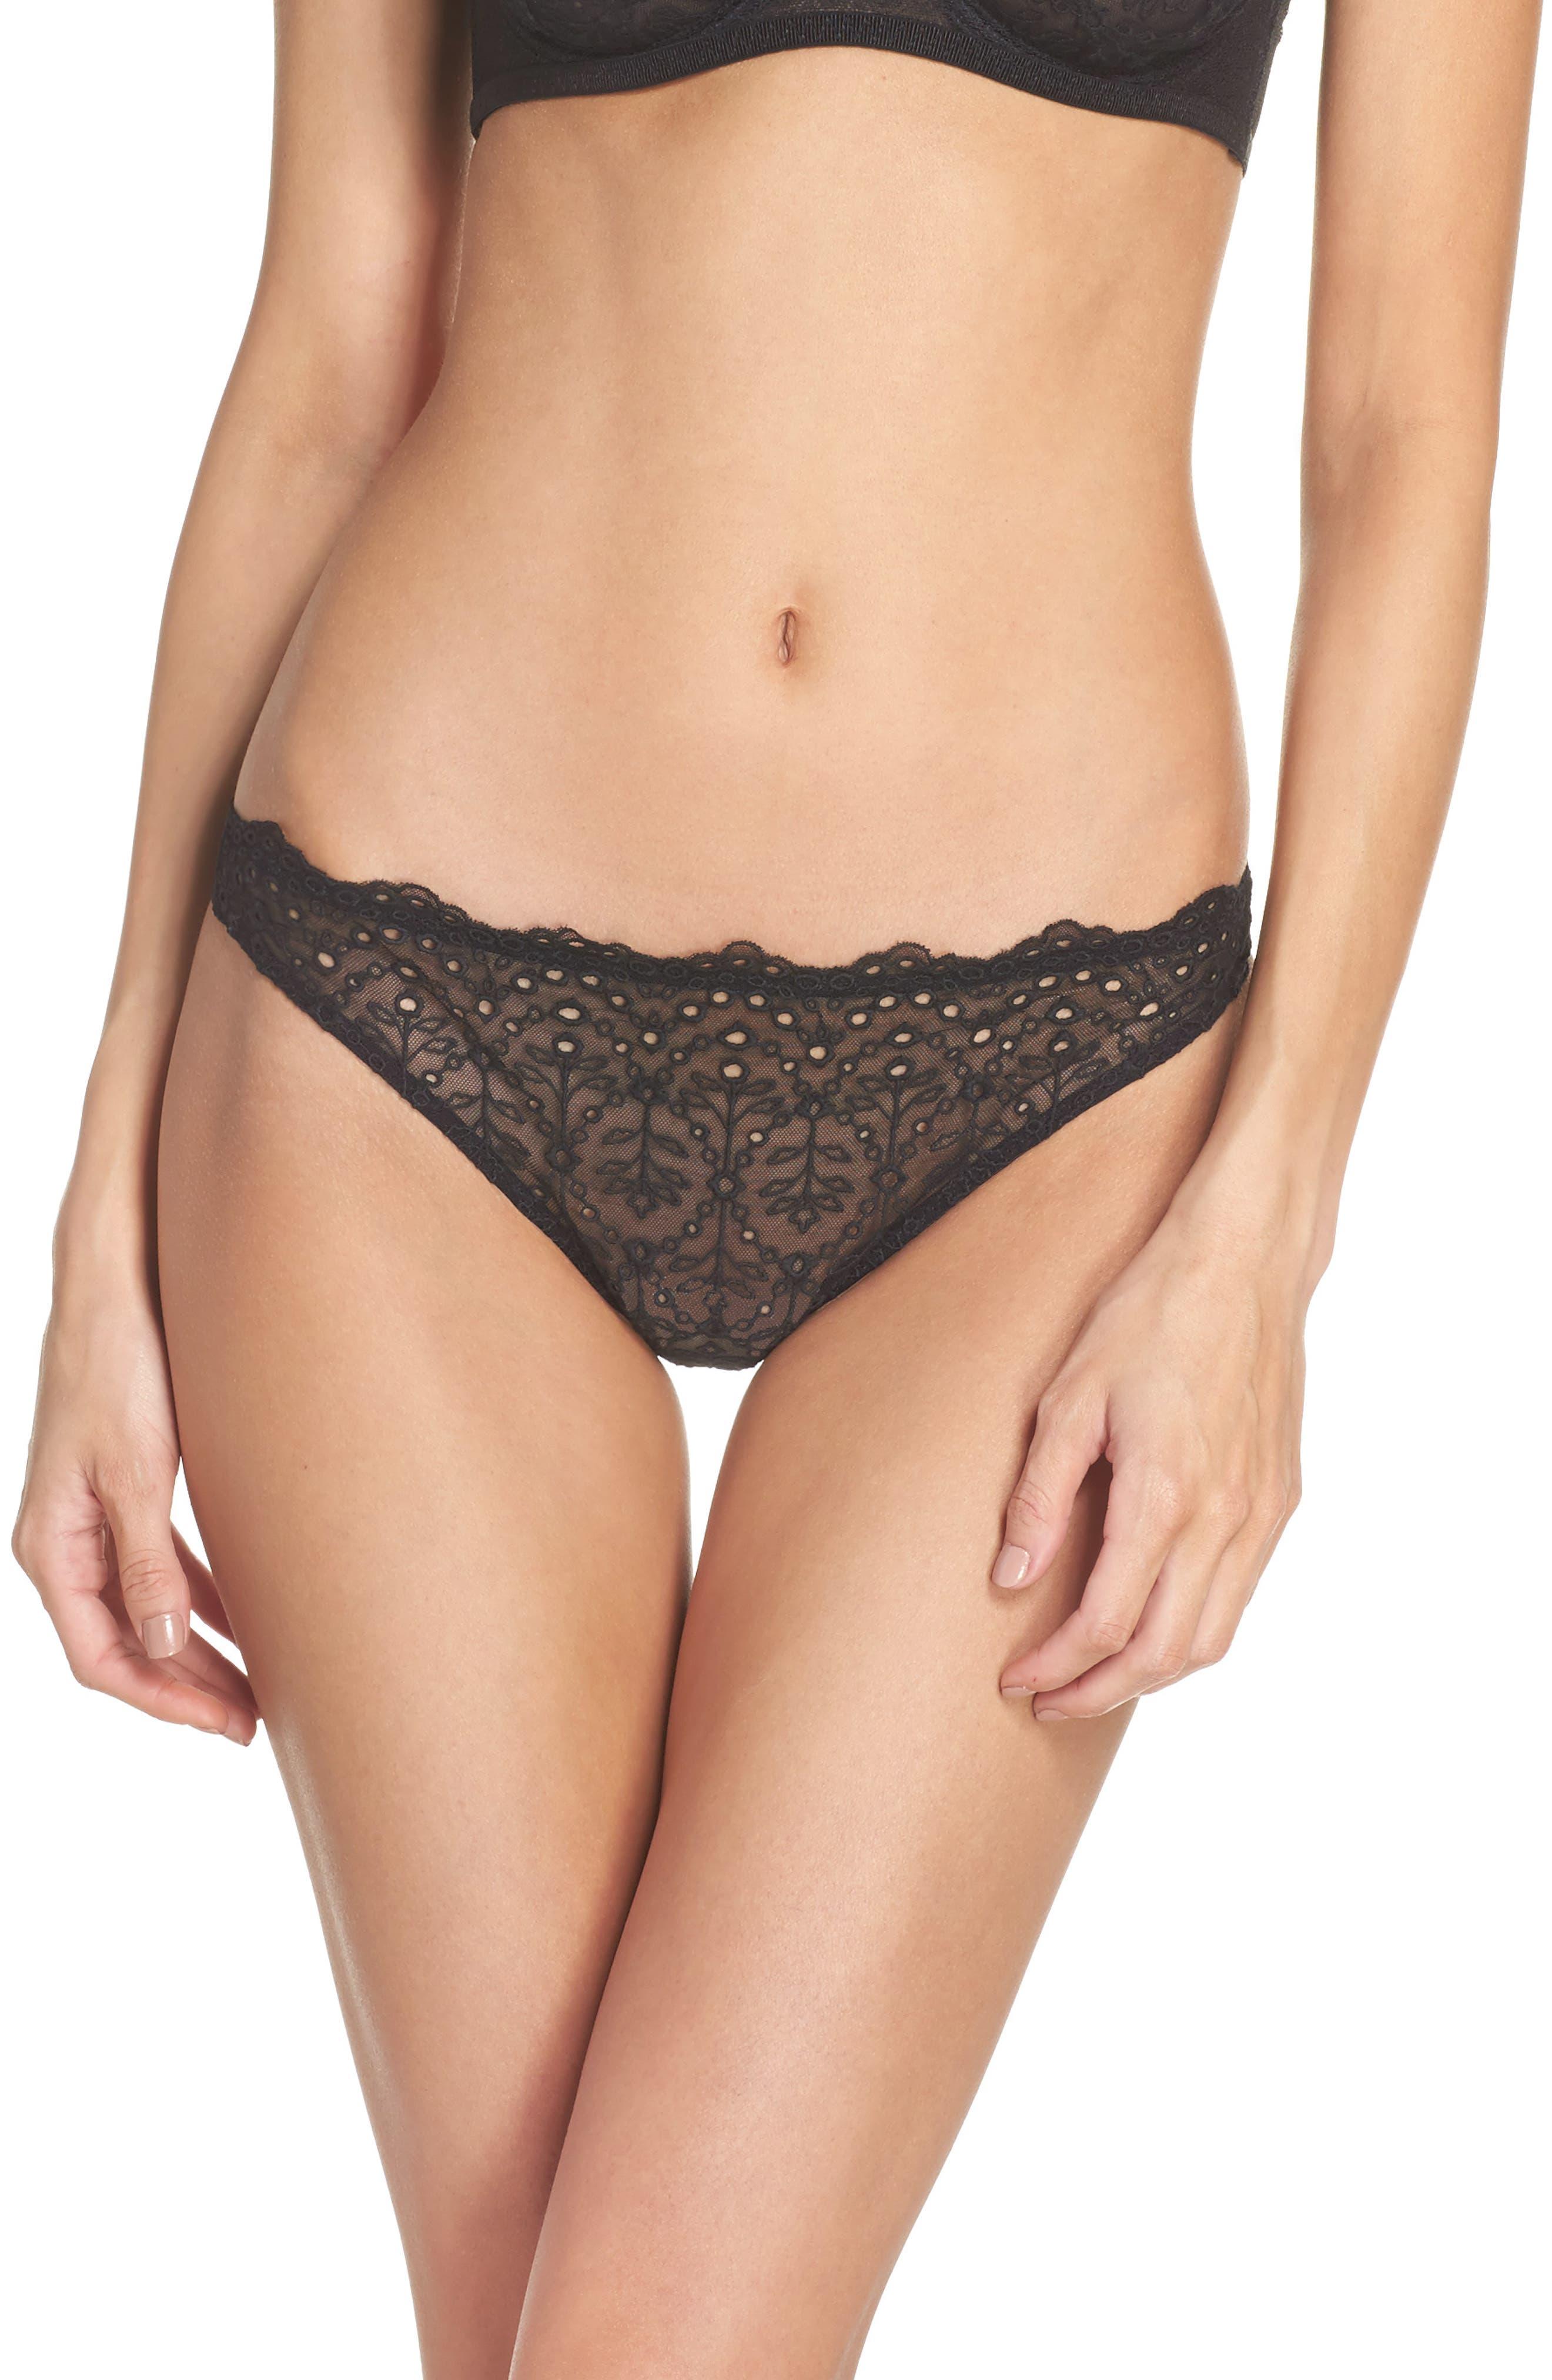 Intimately FP St. Tropez Tanga Panties,                         Main,                         color, 001